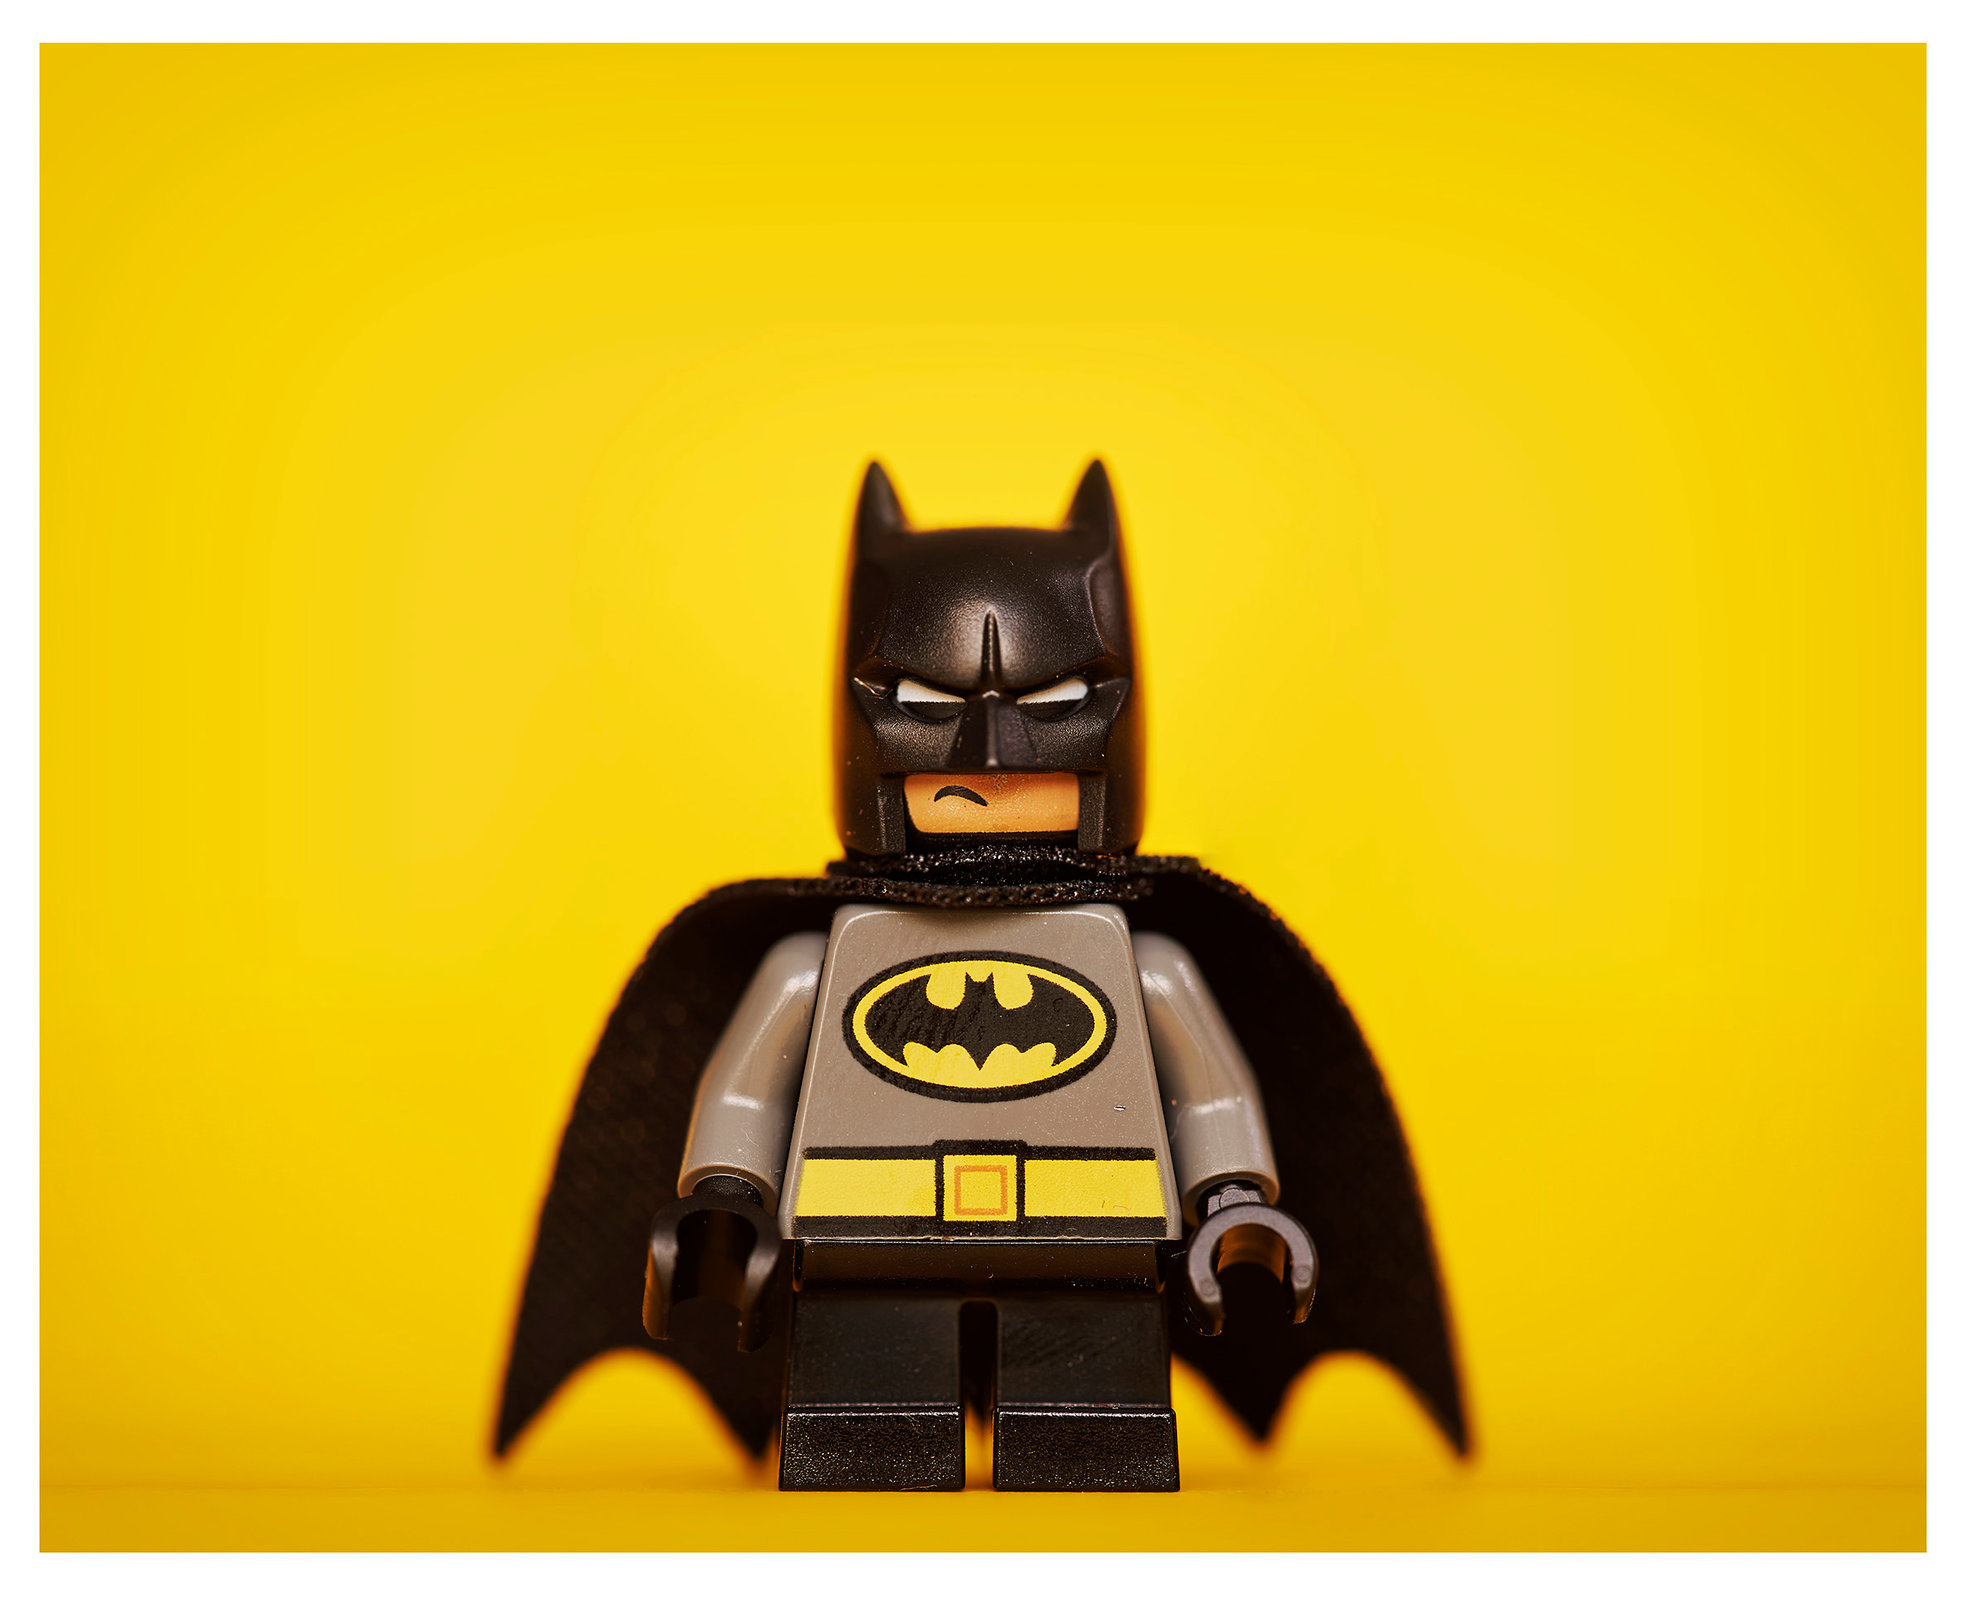 the mighty batman